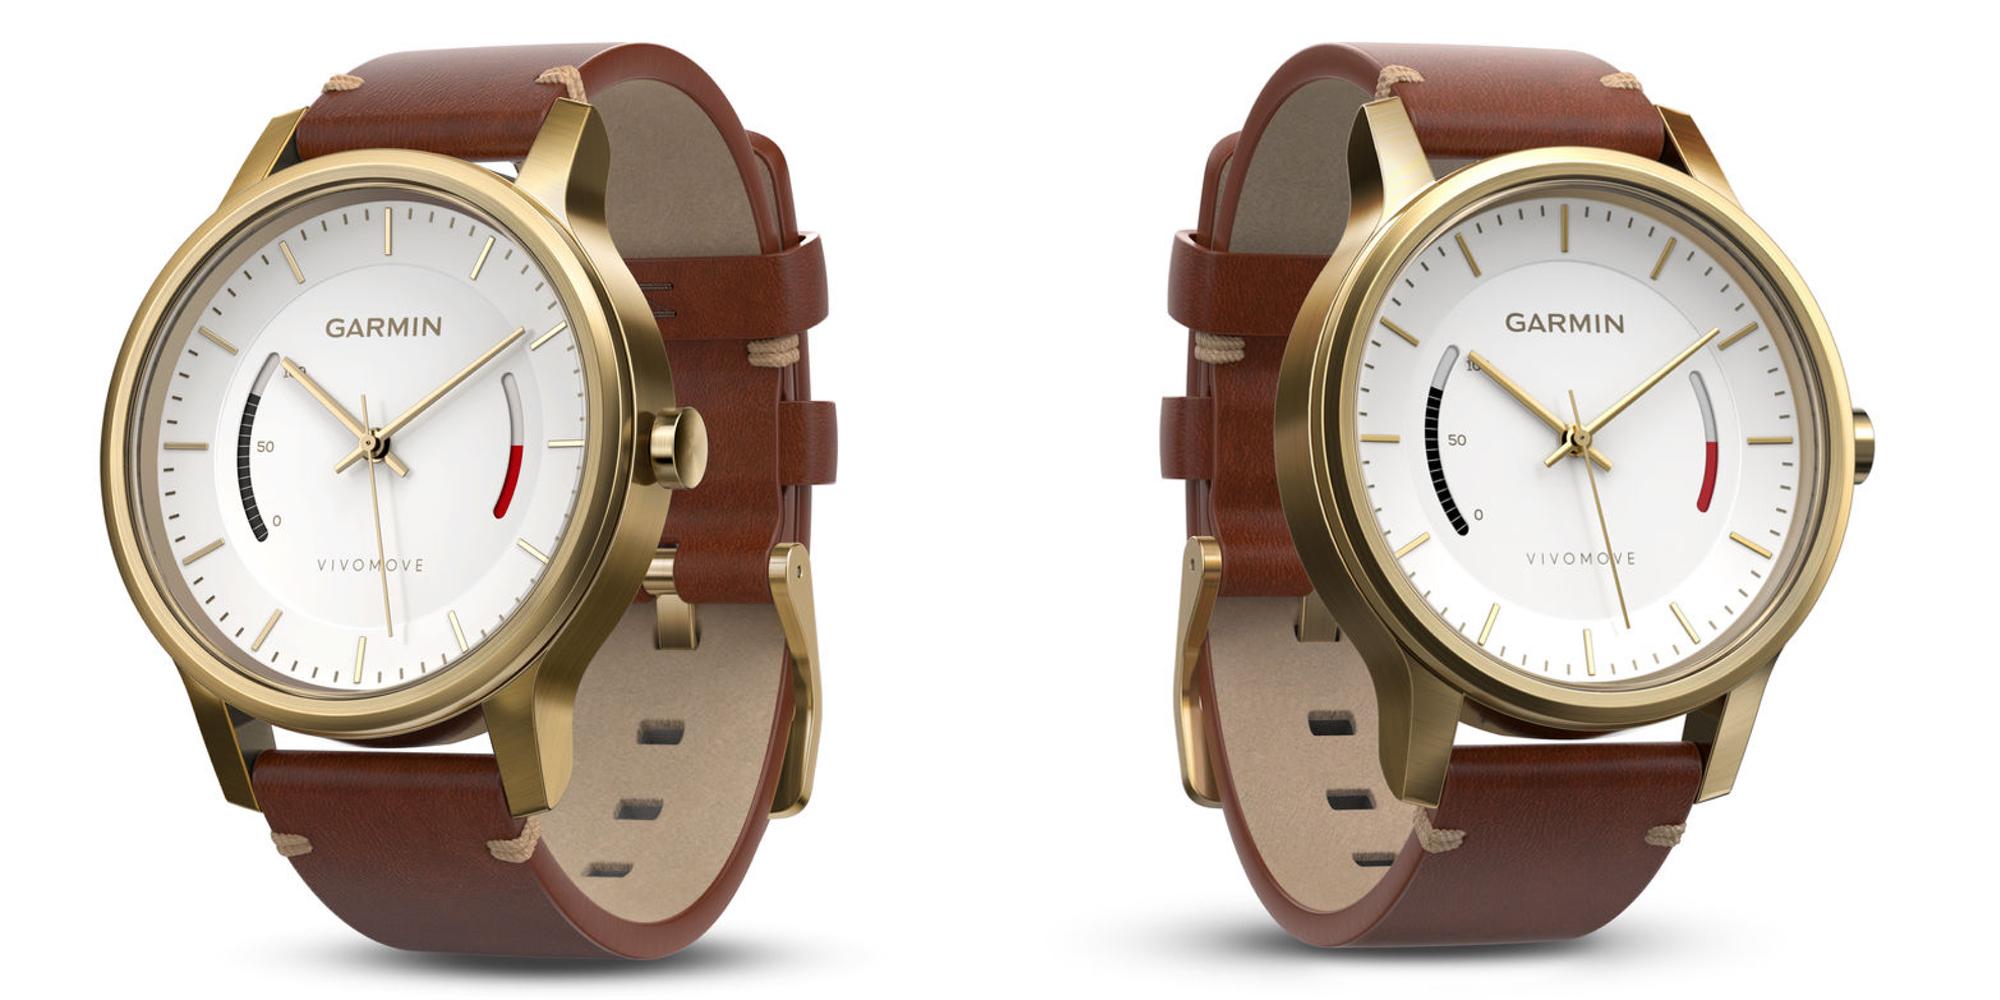 Garmin Vivomove Premium Activity Tracker with leather band drops to $70 (Reg. $200)